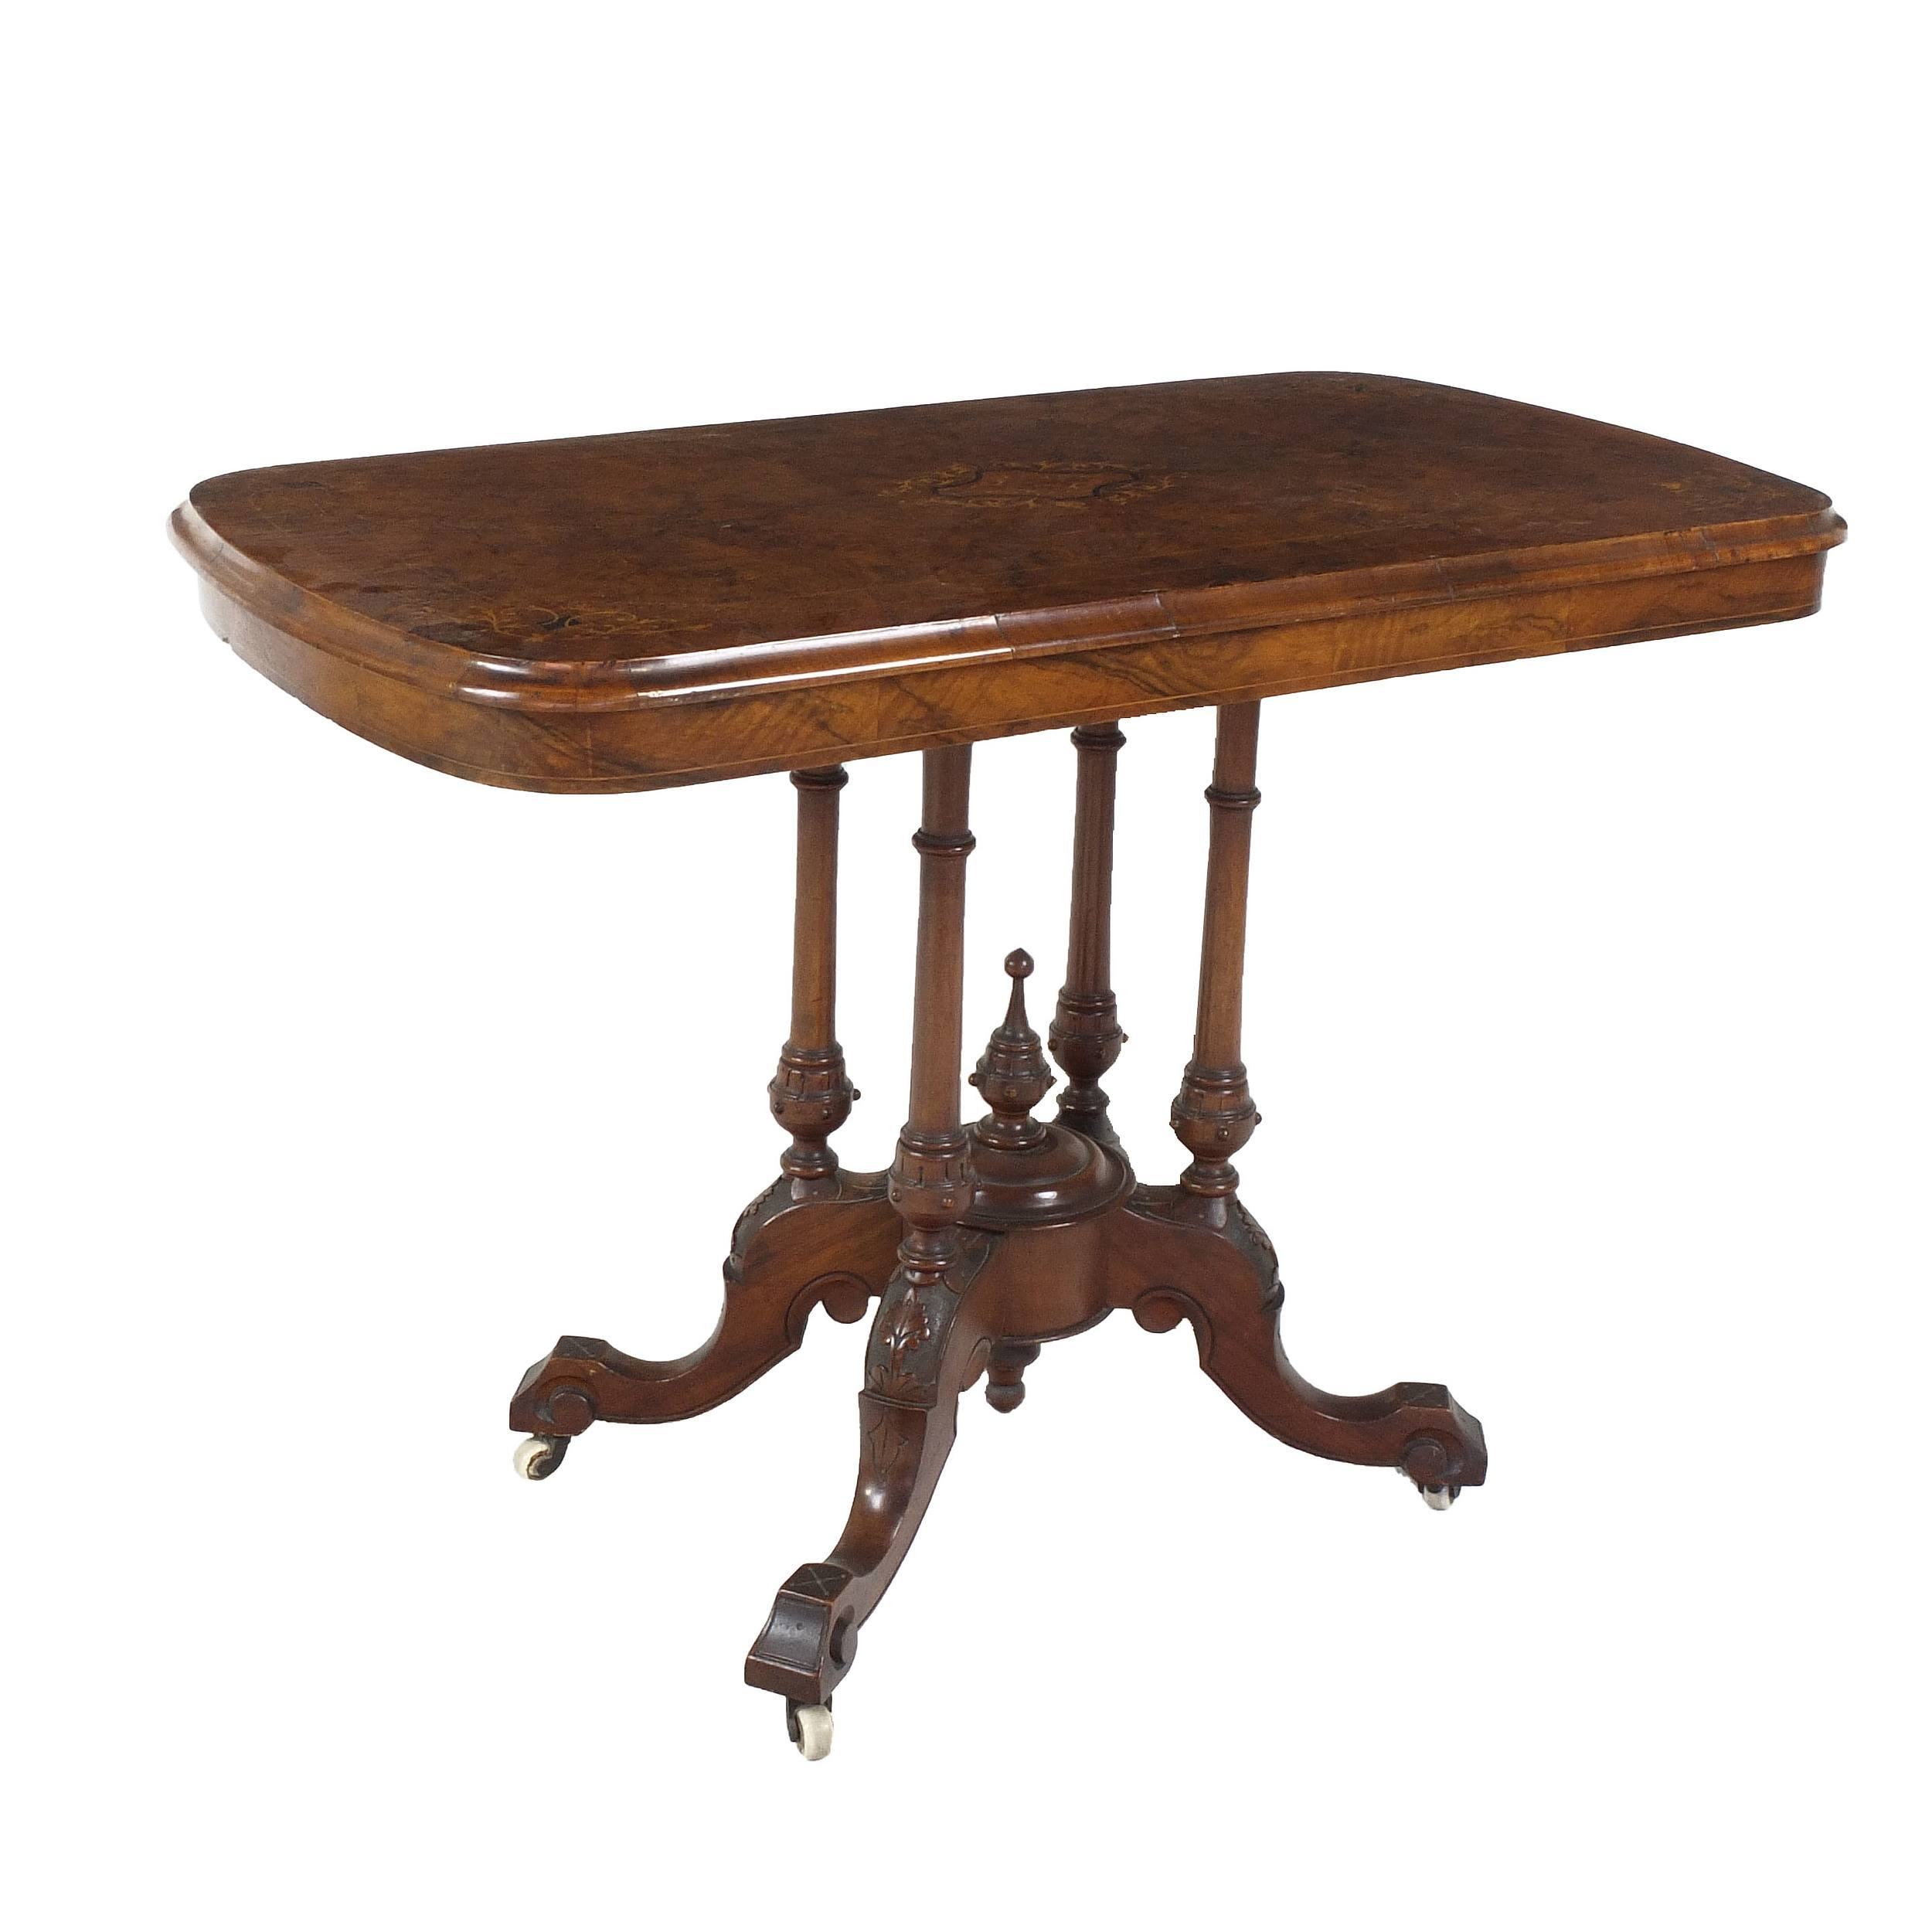 'Victorian English Walnut Loo Table with Inlaid Top Circa 1880'